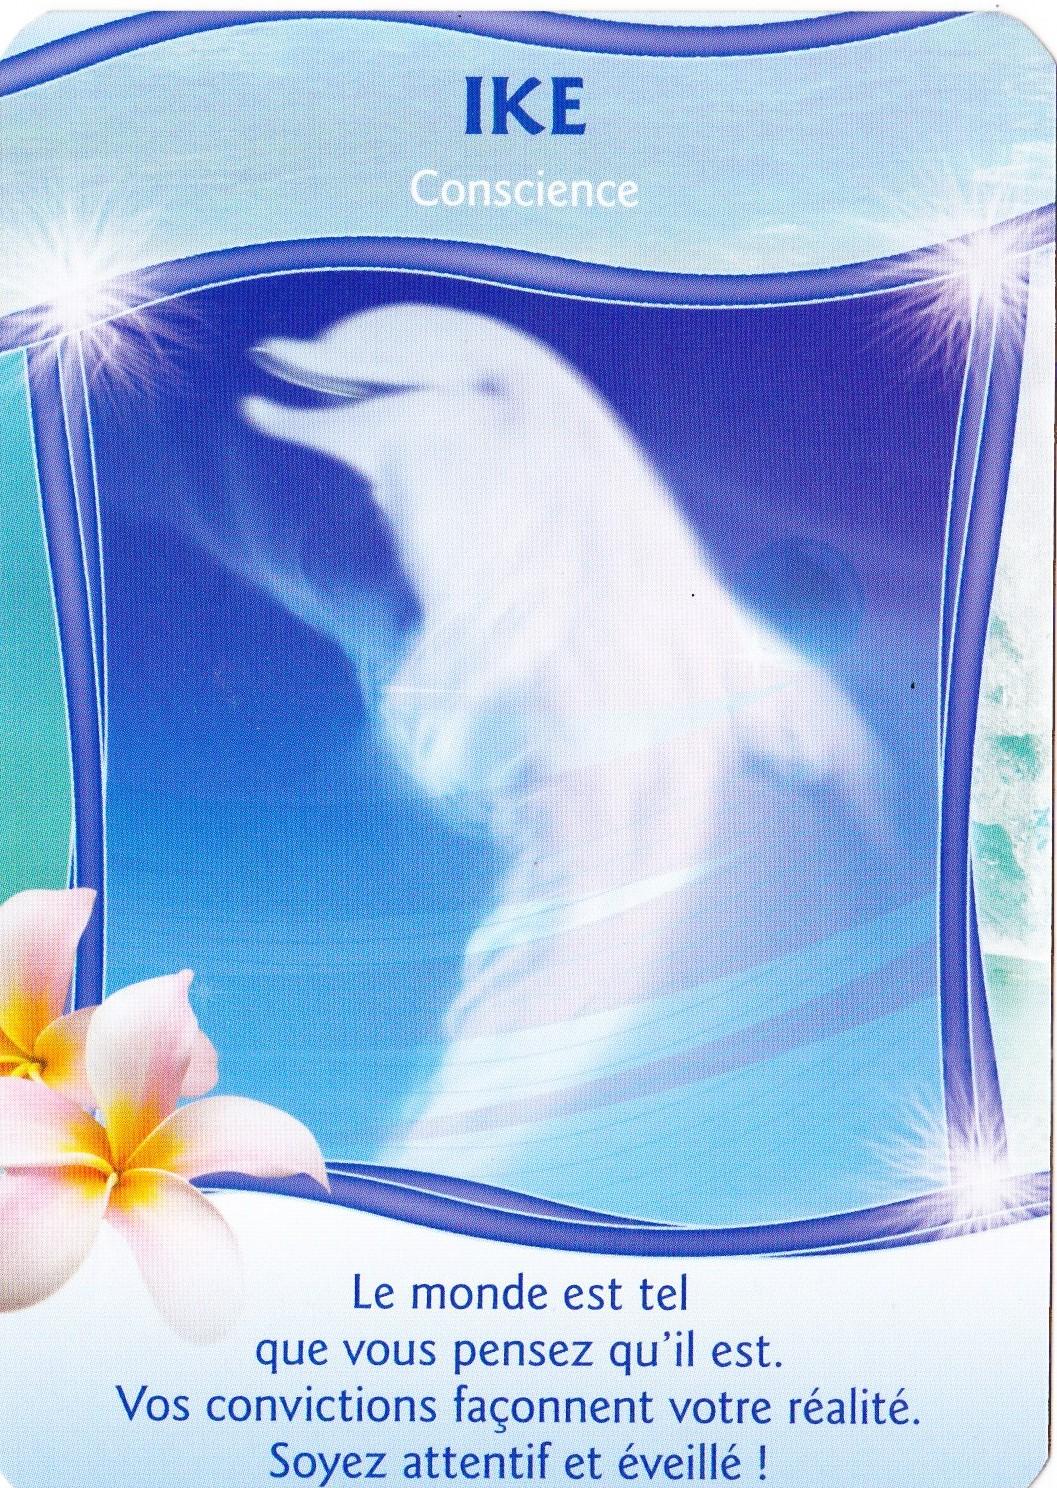 Conscience - Cartes Aloha - A la Source du Chamanisme Hawaîen - Jeanne Ruland